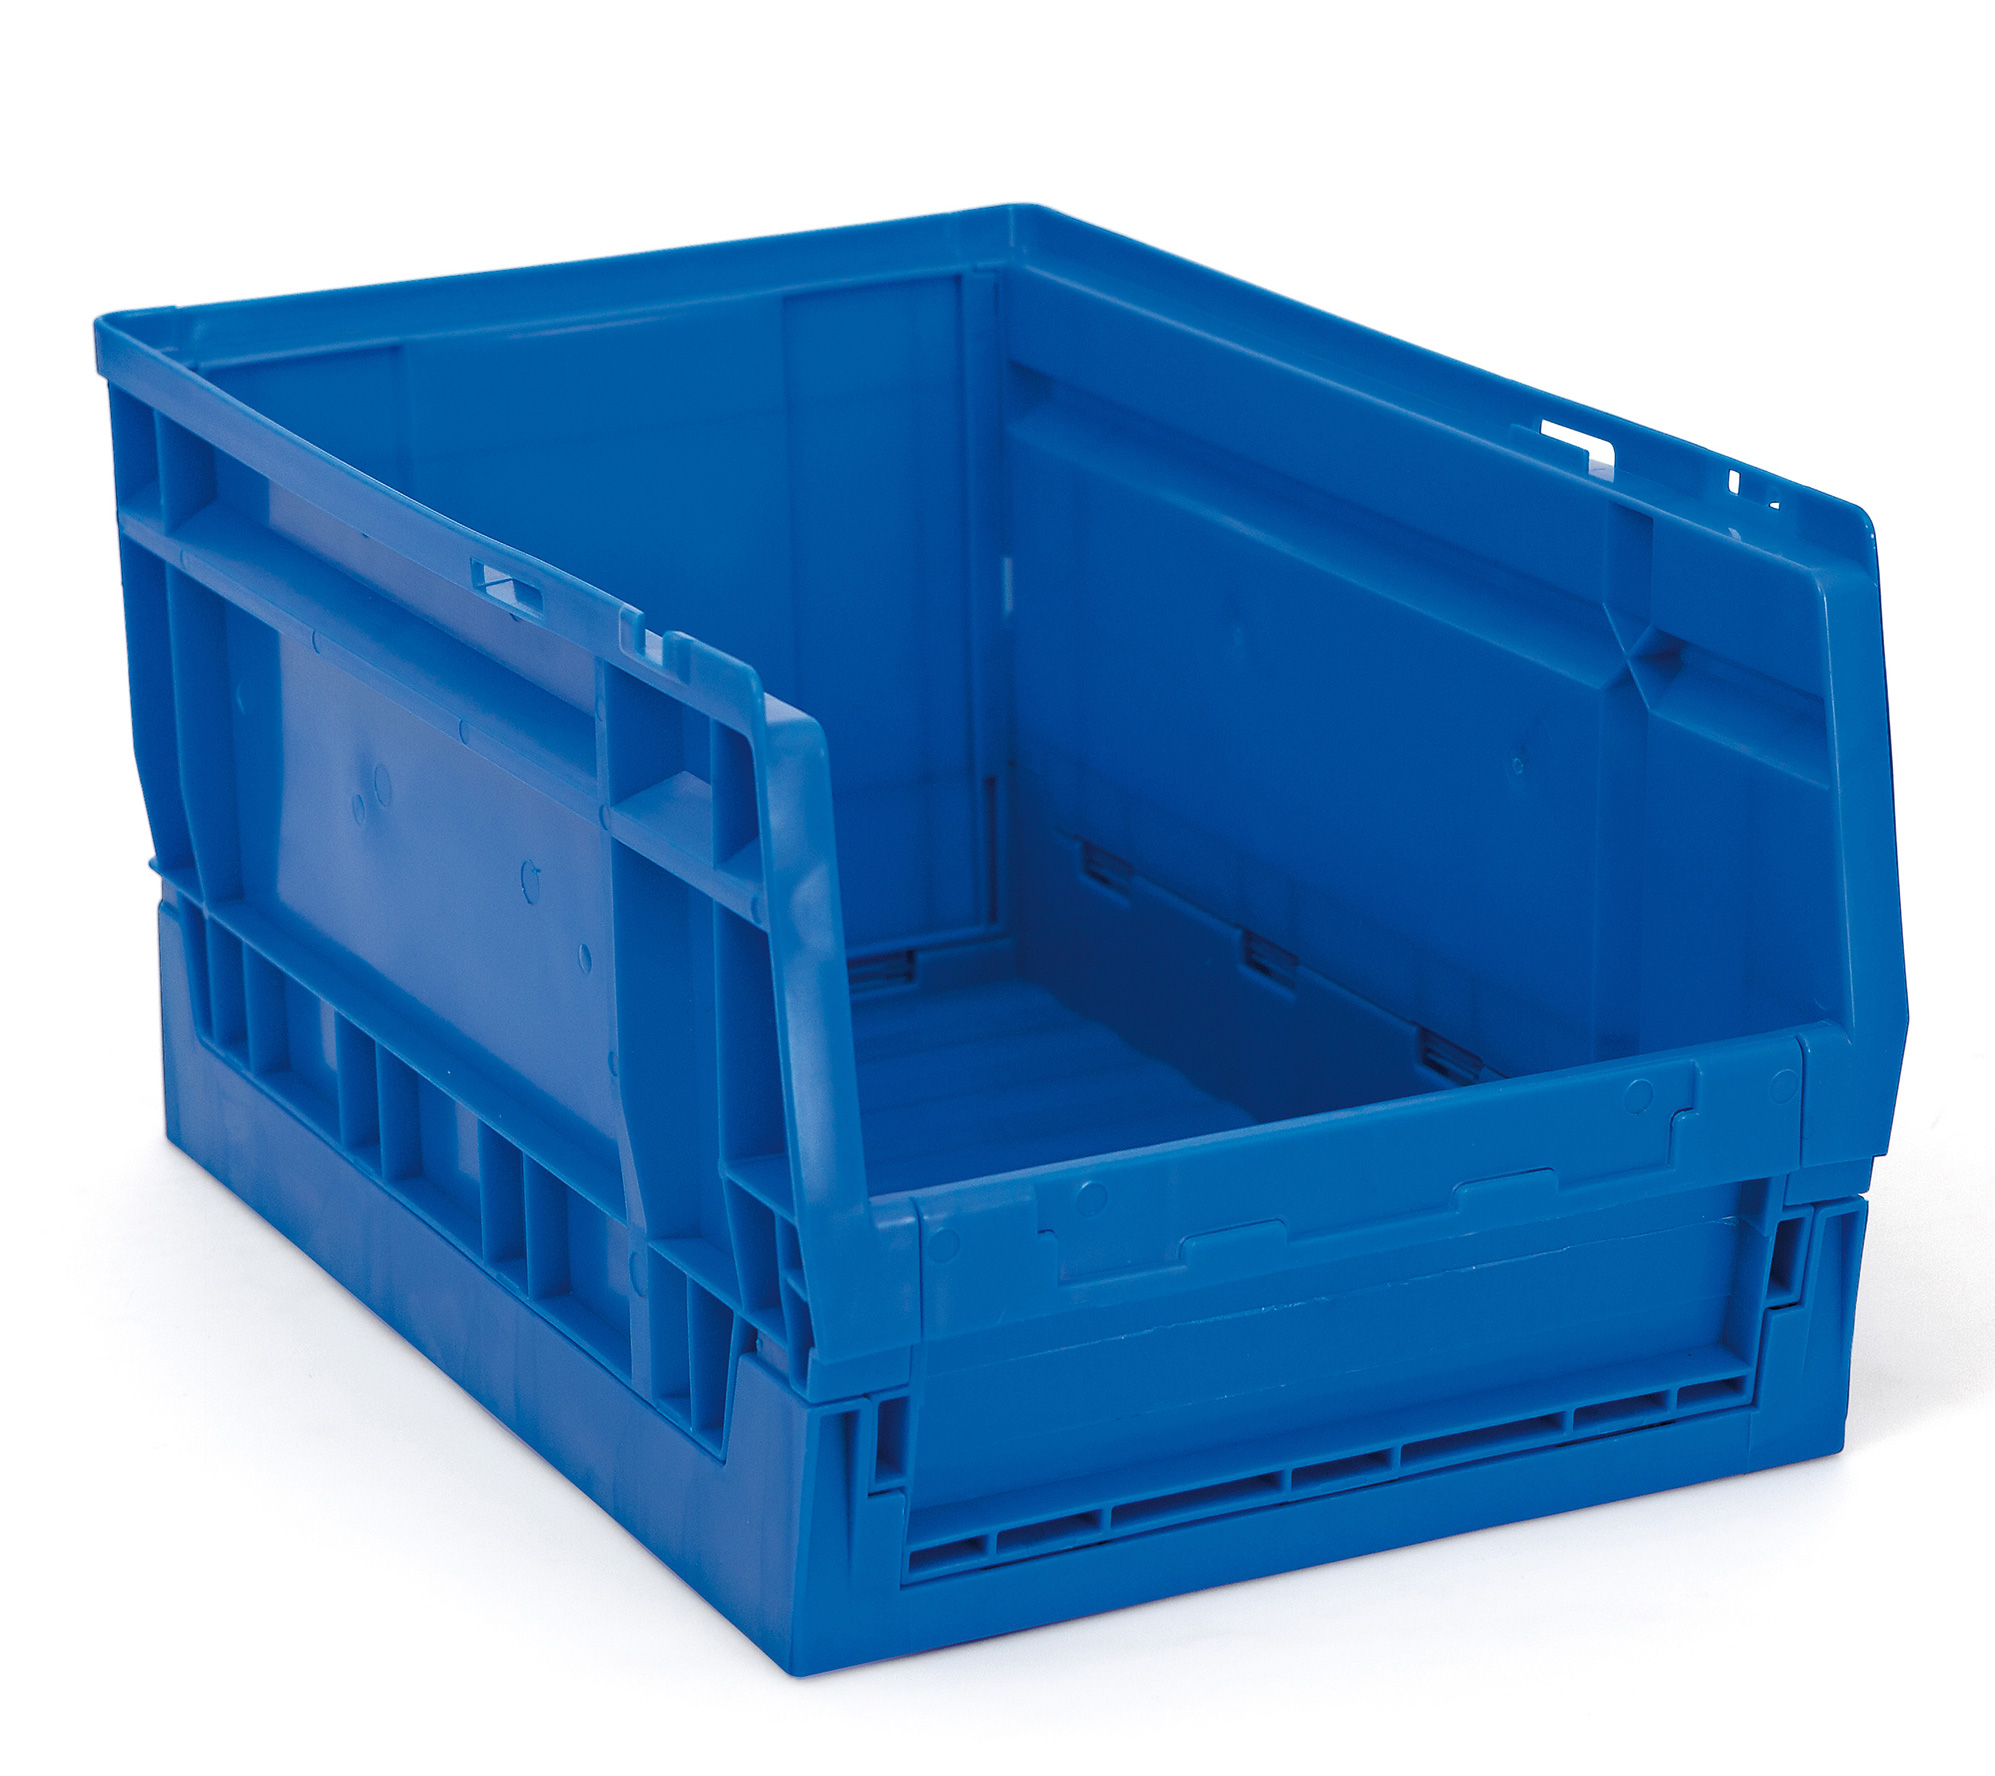 1 gaveta plegable apilable - Gavetas de plástico apilables